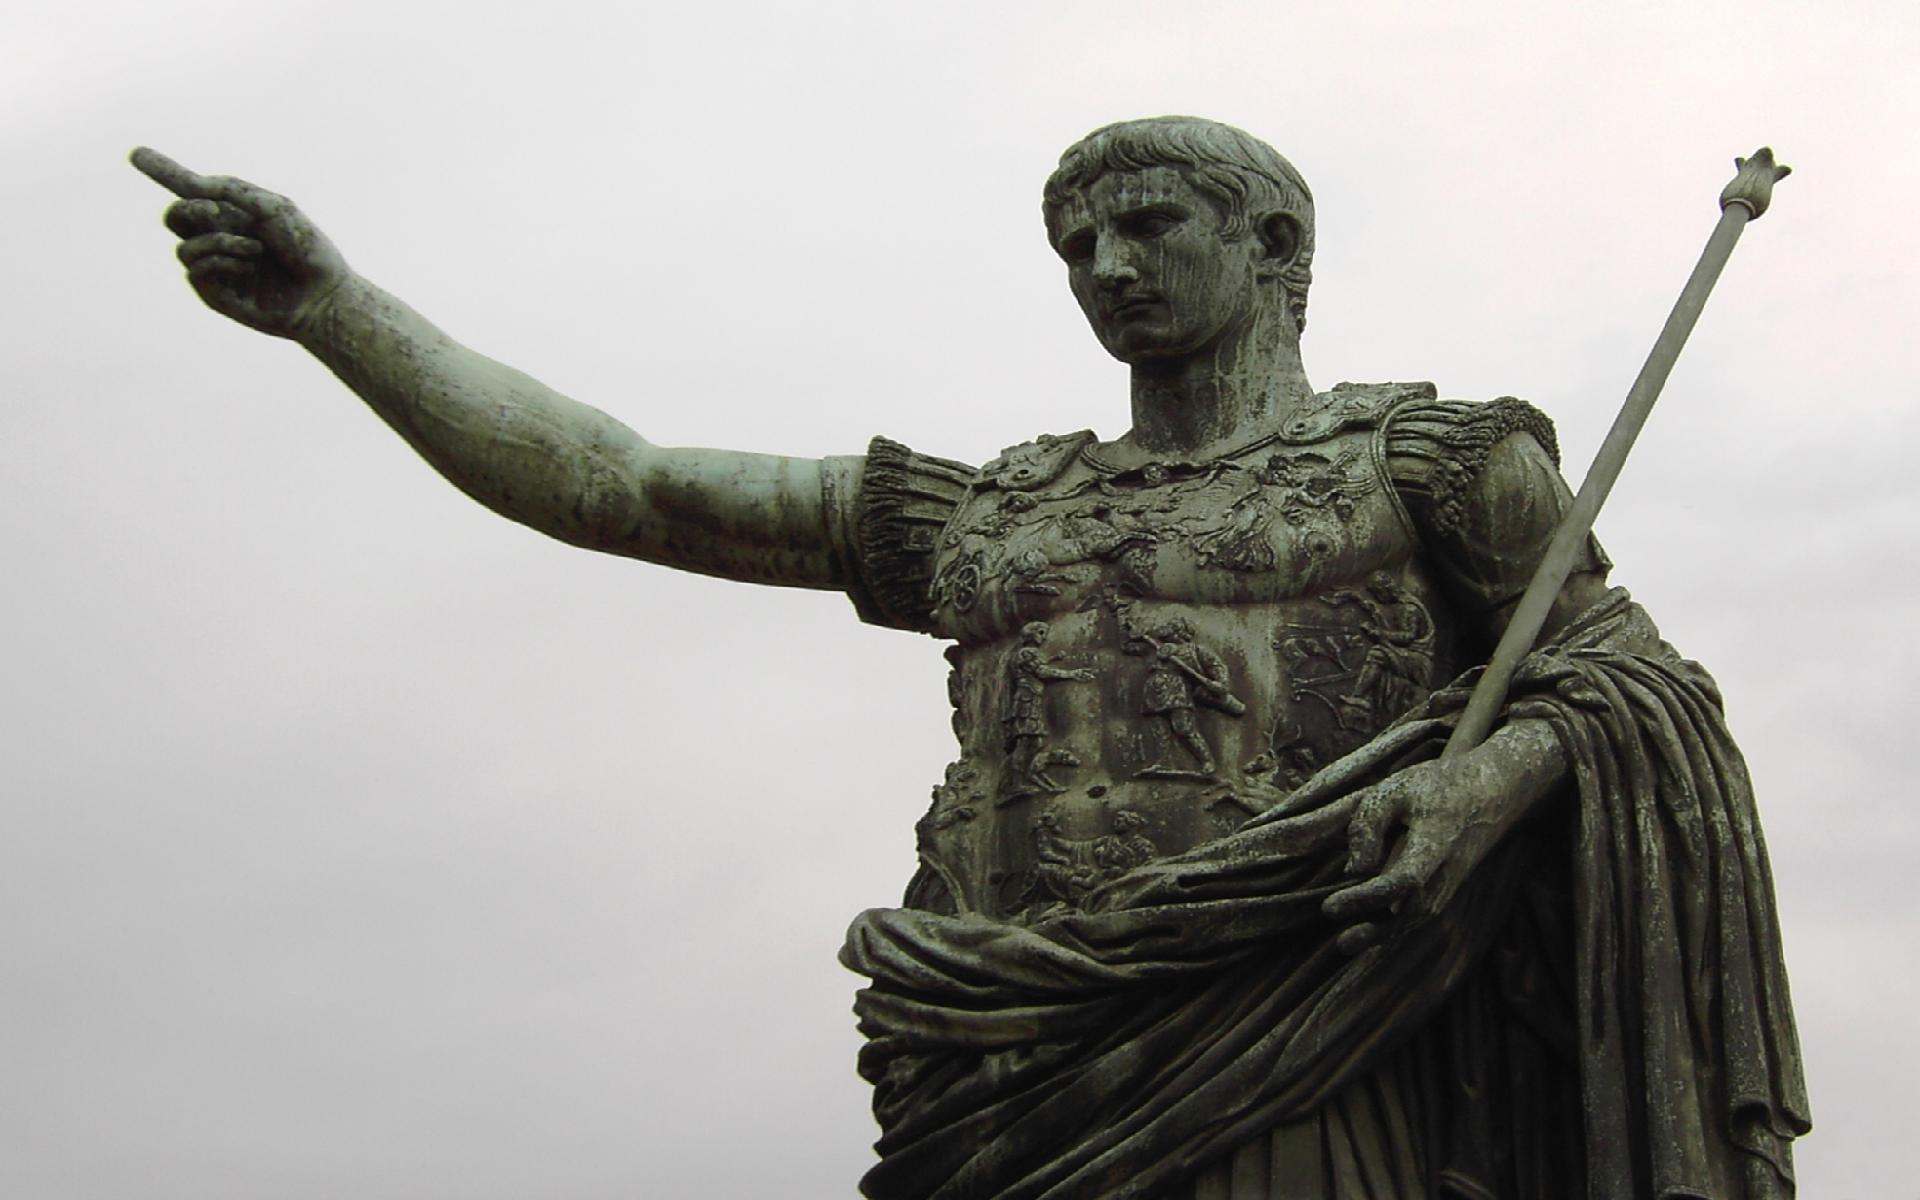 Rome Latin Wallpaper 1920x1200 Rome Latin Statues EMPERADOR 1920x1200